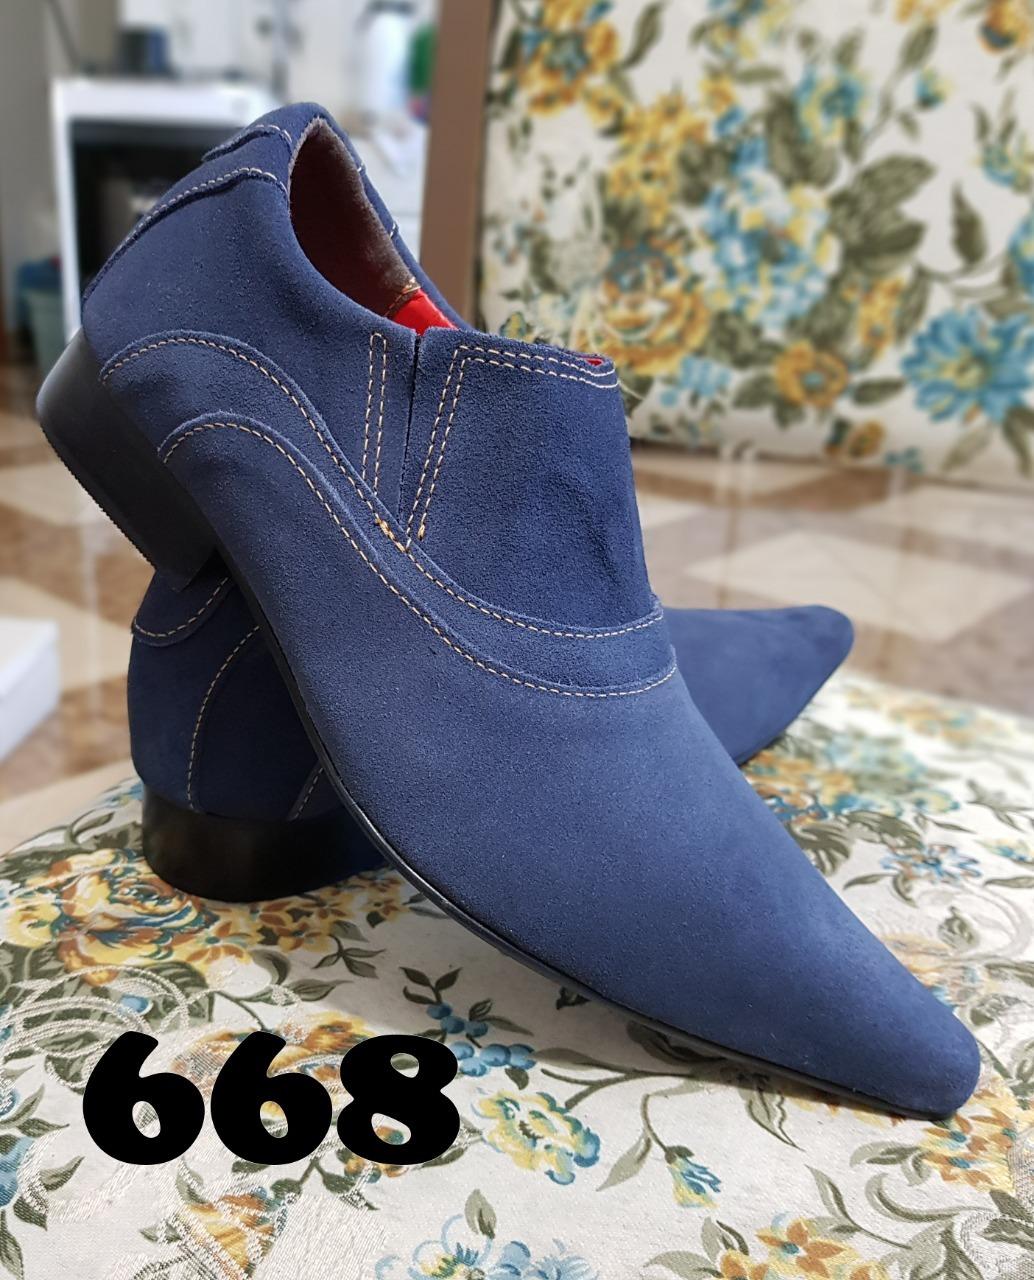 668 Sapatos masculinos nobuck azul ITA Comfort